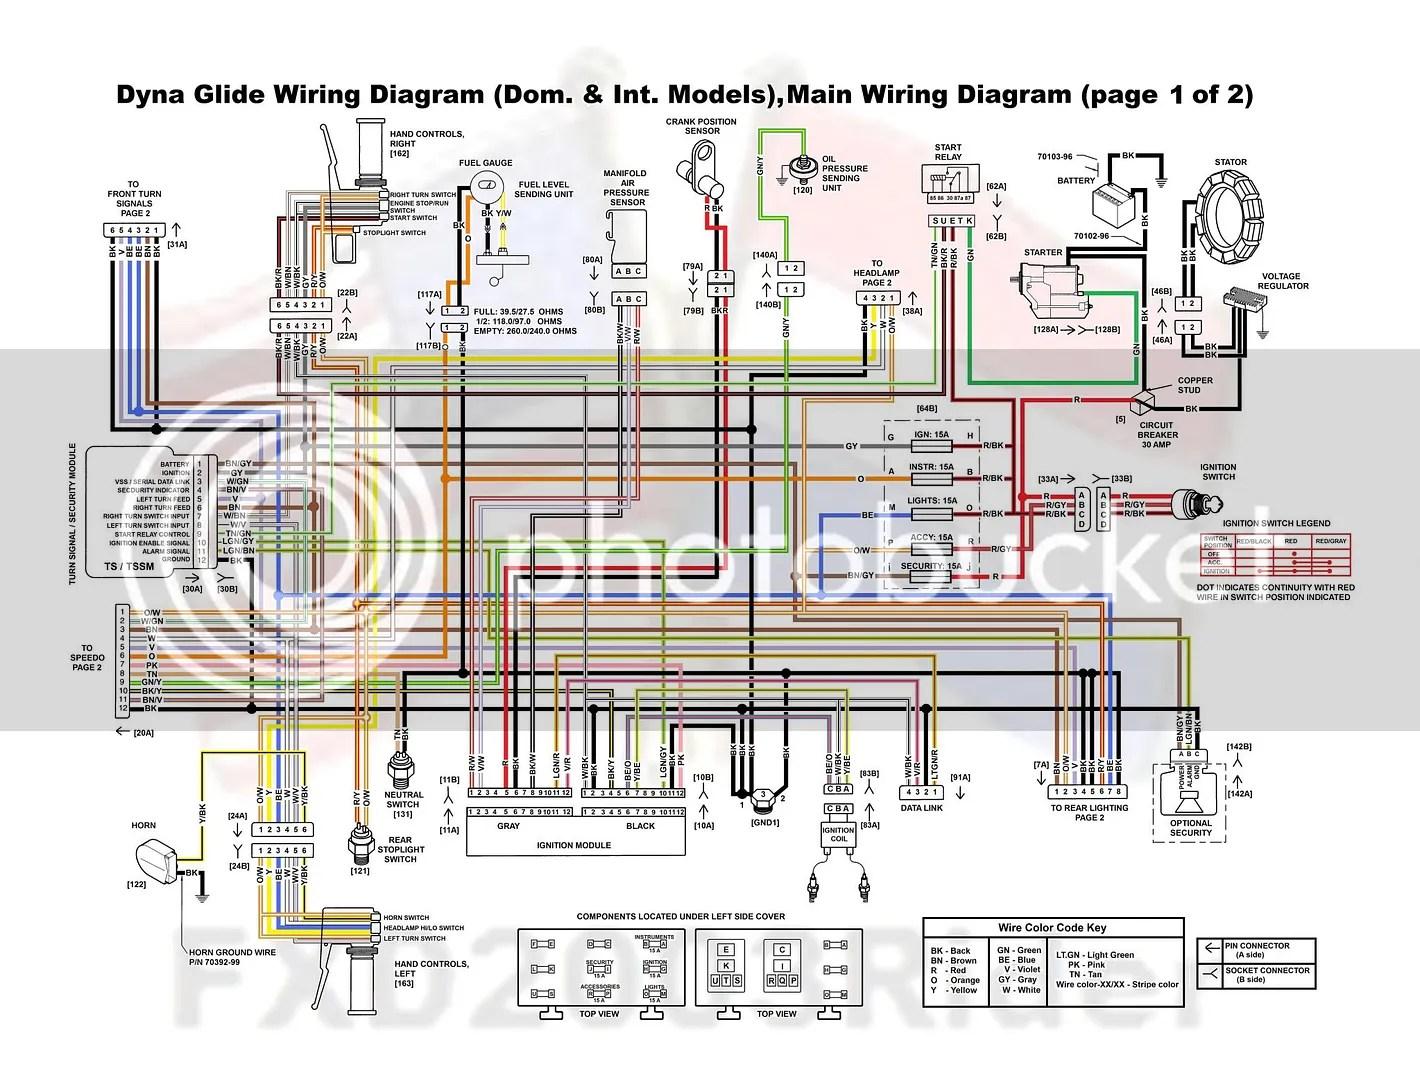 wiring diagram for a mini harley 43cc wiring diagram mini harley 43cc scooter wiring diagram [ 2047 x 1557 Pixel ]